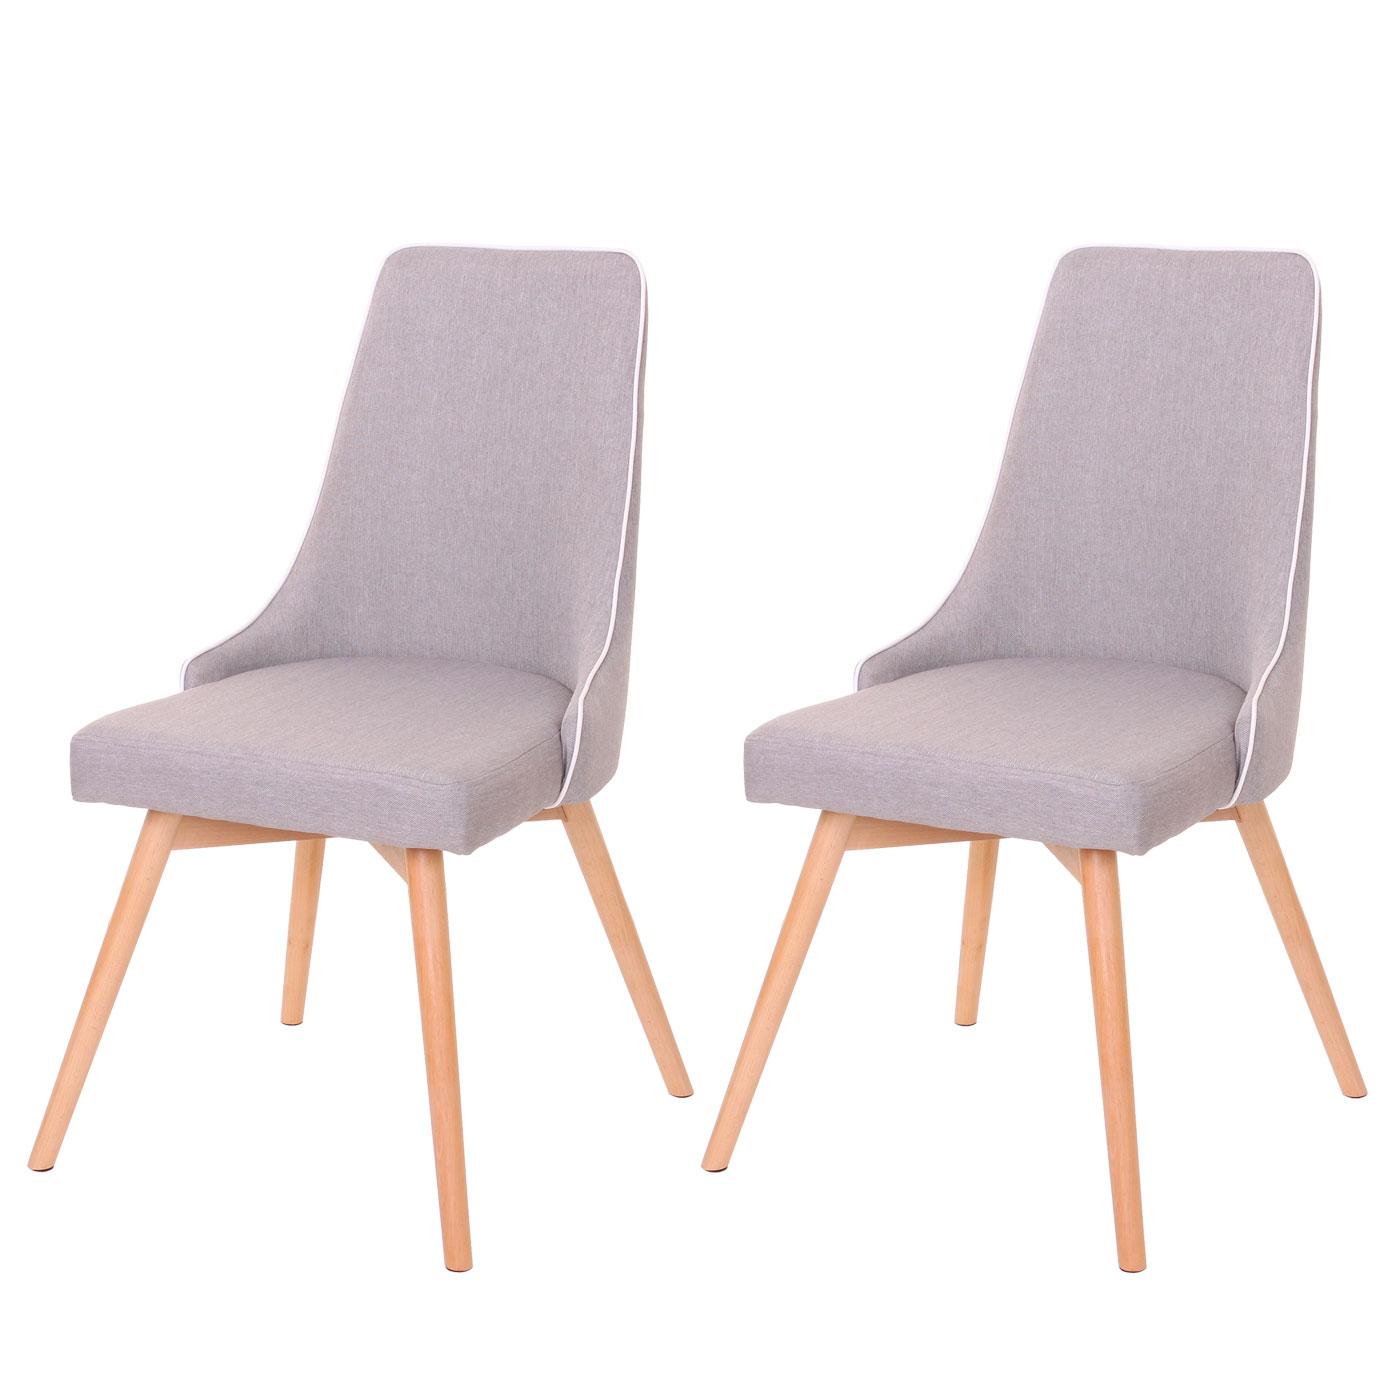 2x esszimmerstuhl hwc b44 stuhl lehnstuhl retro 50er jahre design textil grau. Black Bedroom Furniture Sets. Home Design Ideas